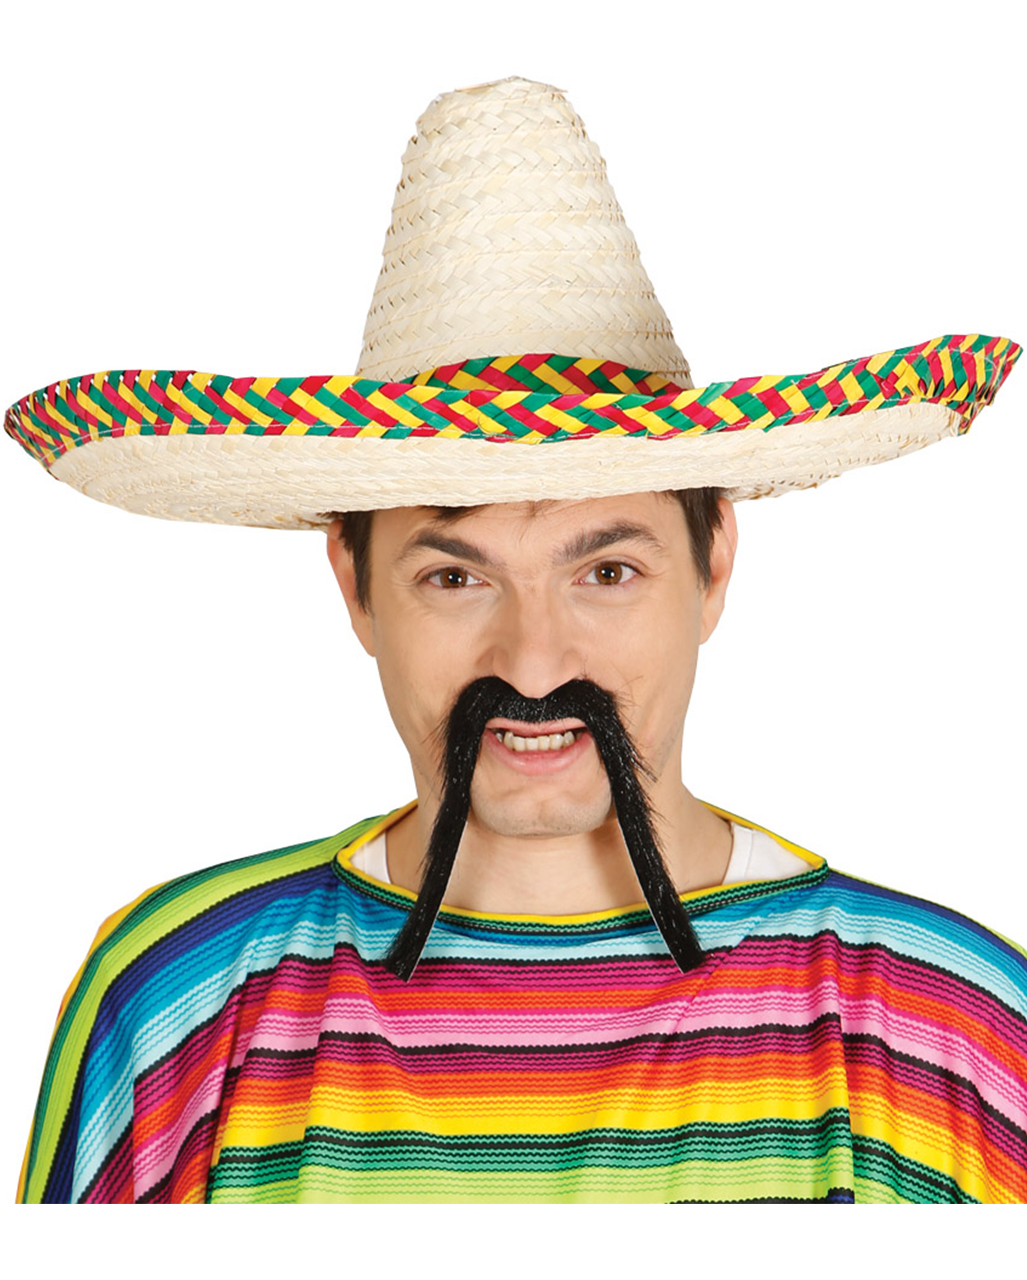 Sombrero With Colorful Border  cace660aa7e3